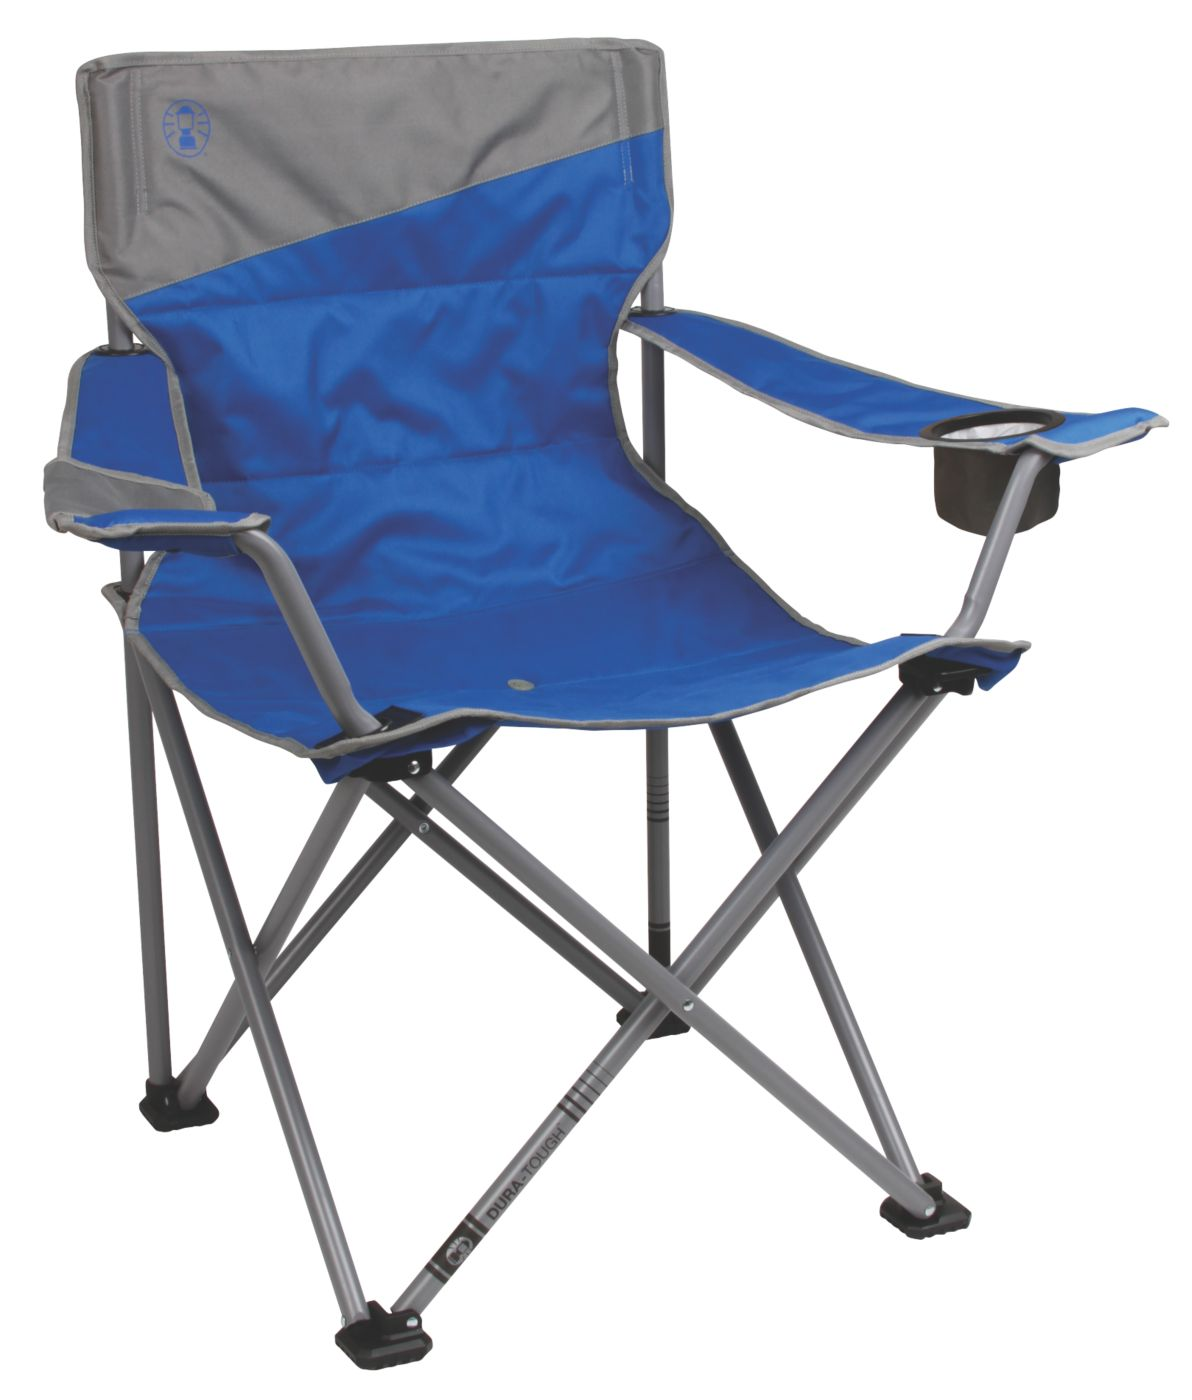 bigntall quad chair - Heavy Duty Folding Chairs